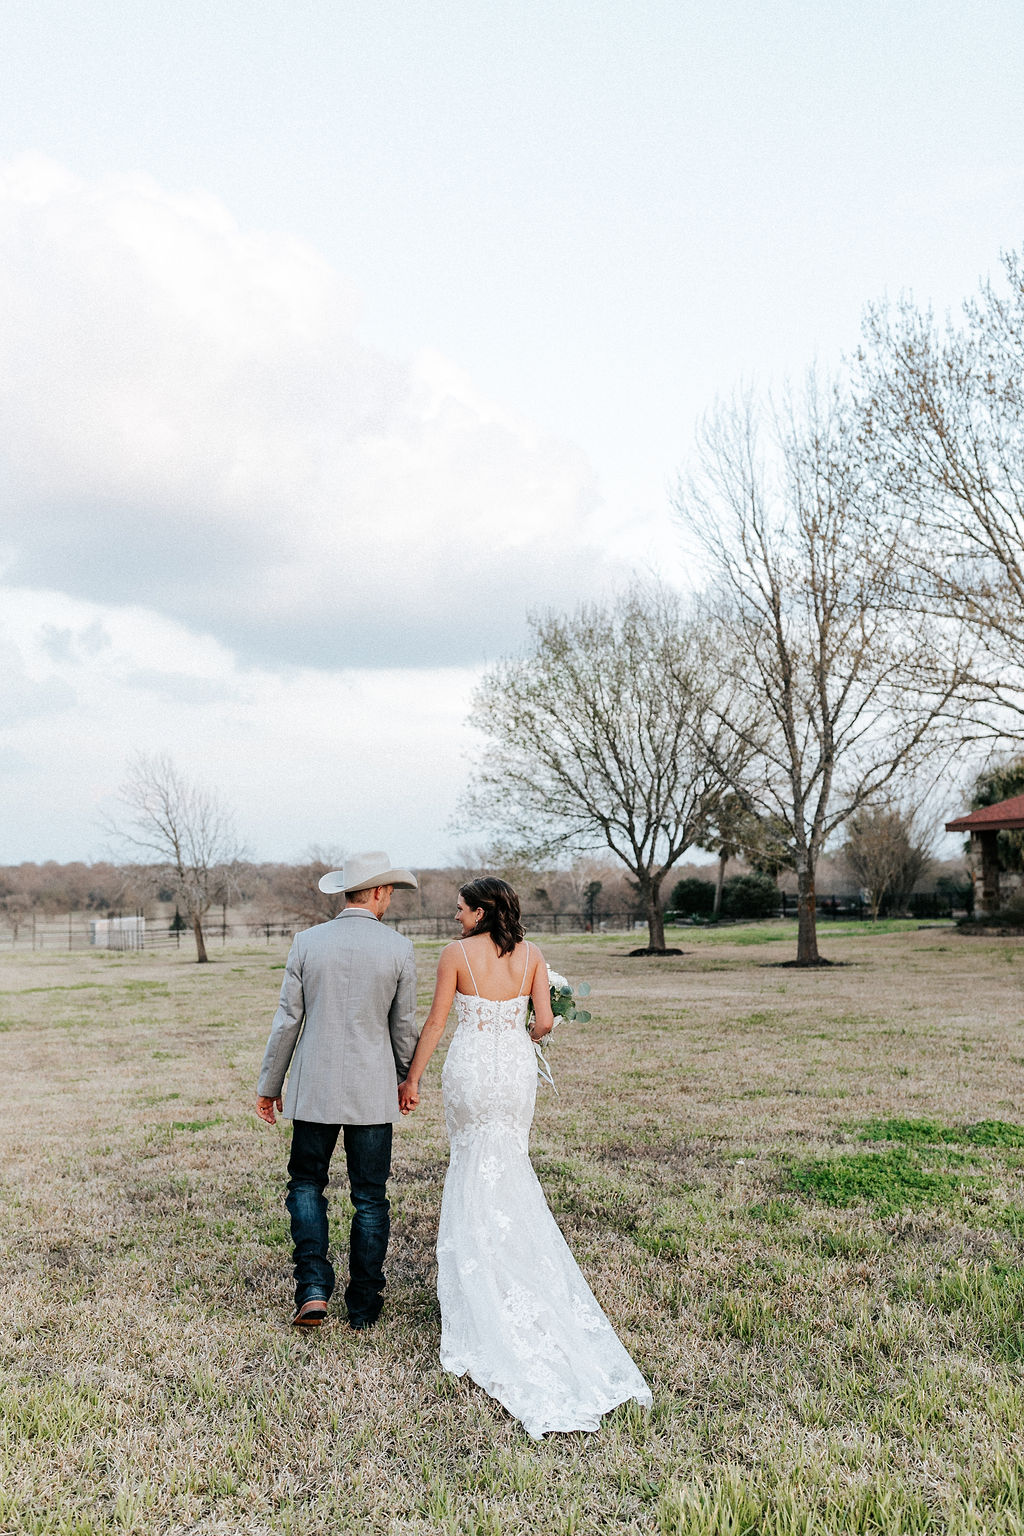 Epoch Co+ Destination wedding planner | First Look Photo Ideas with Groom | Outside Rustic | Wedding Dress  | Velvet + Wire Photography | Austin Wedding Planner